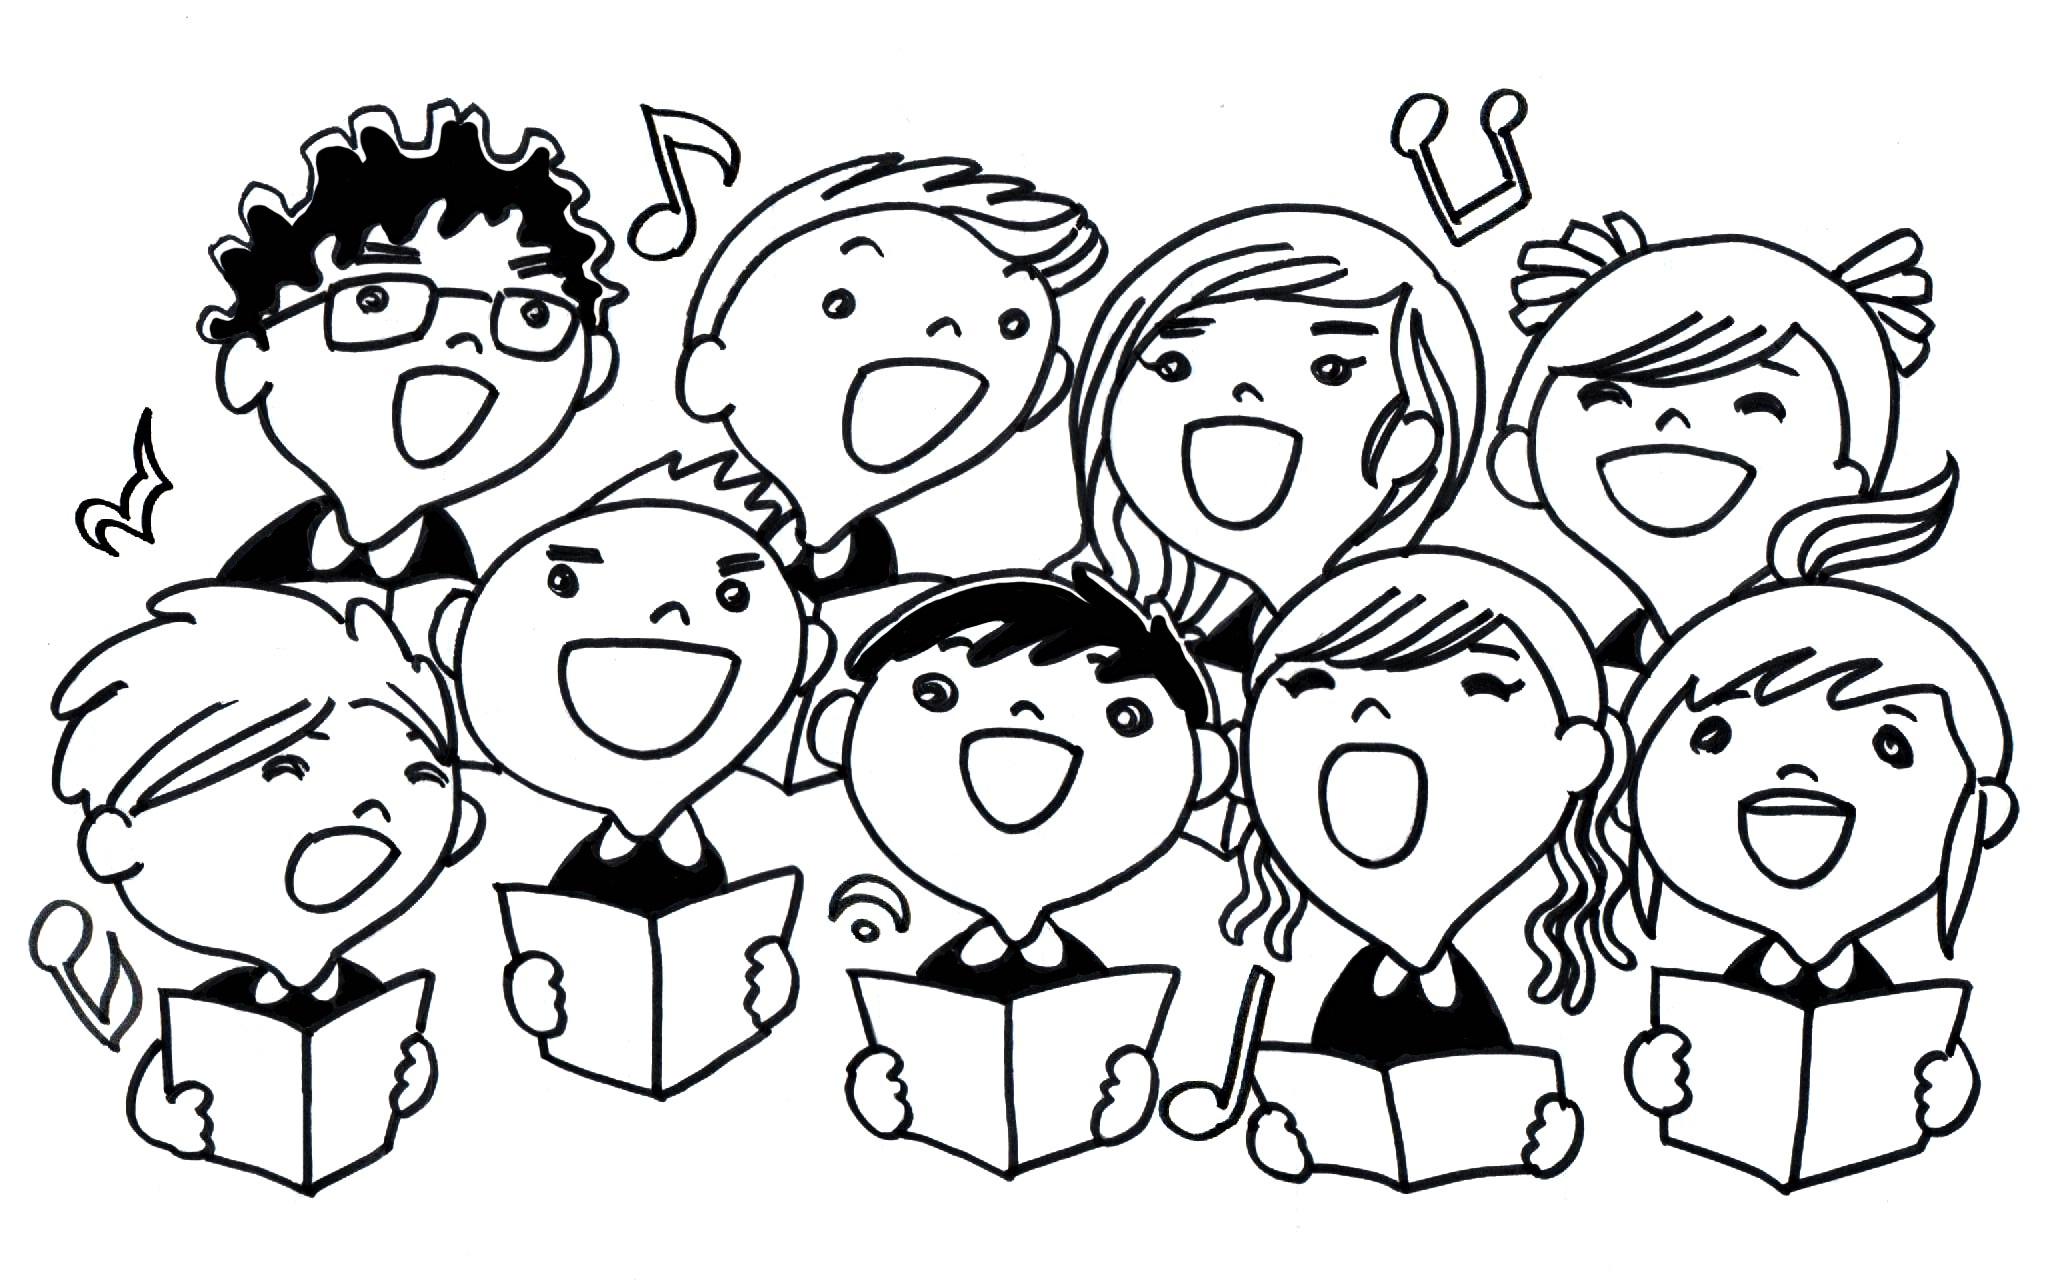 Choir panda free images. Chorus clipart black and white